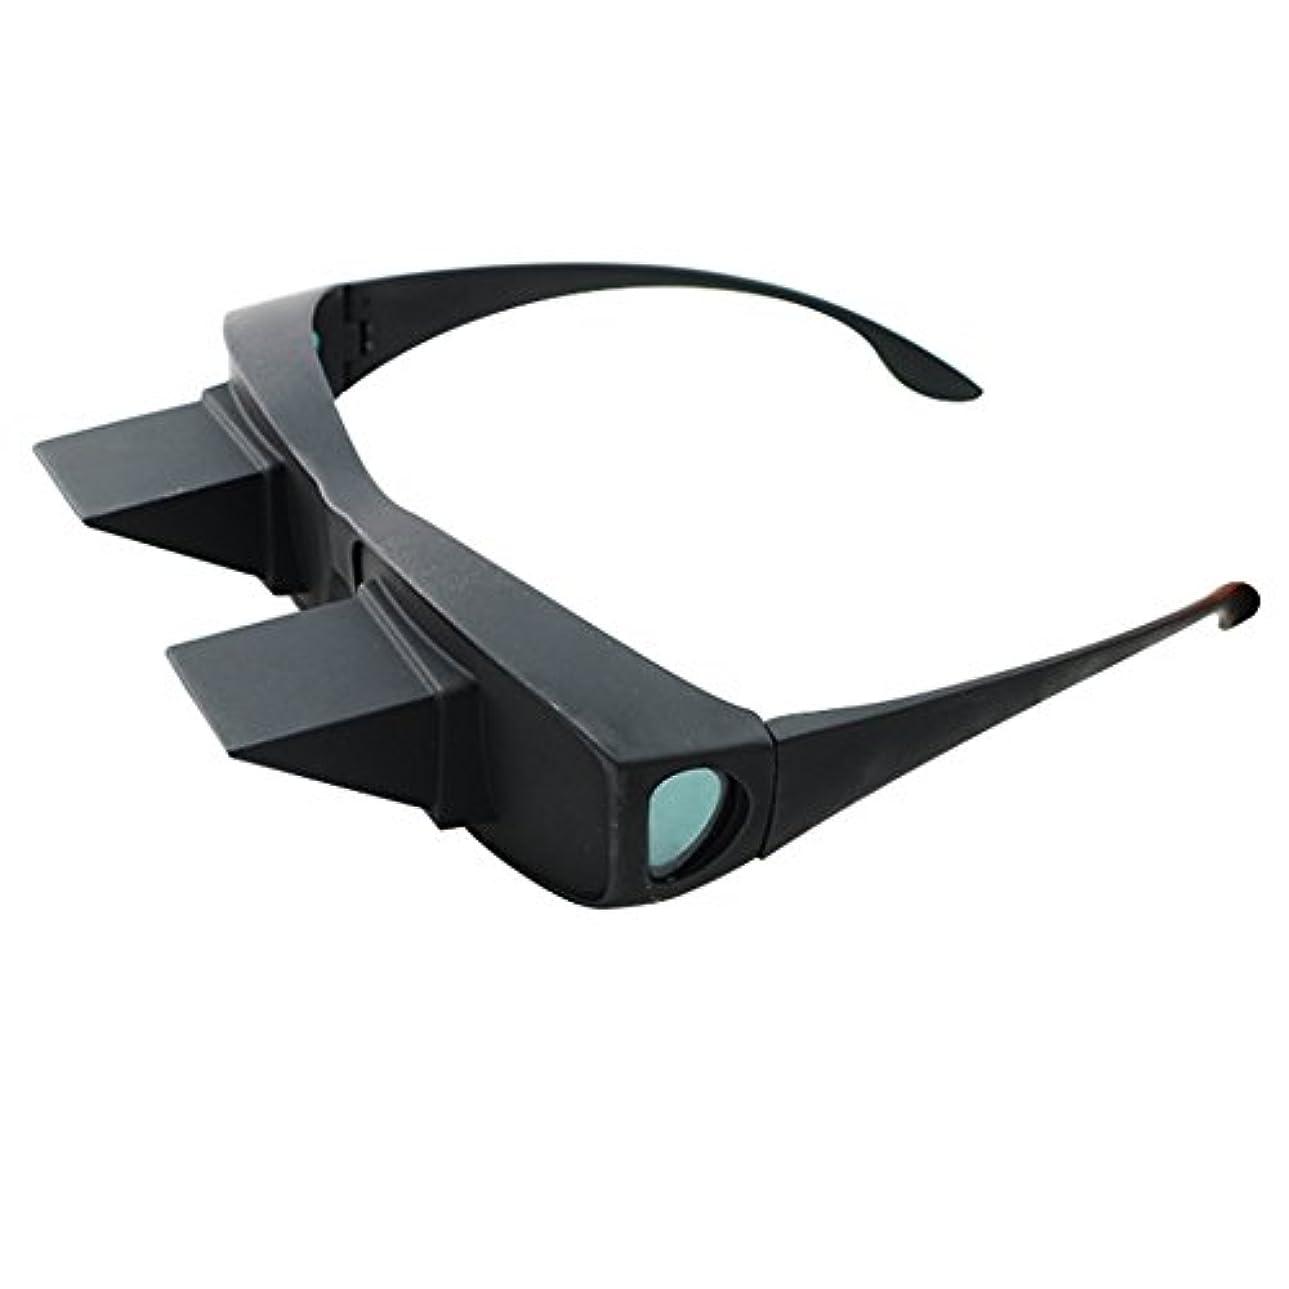 Finlon 怠け者メガネ 仰向けで寝ながらスマホ 読書 TV プリズム メガネ 反射メガネ 超便利 快適